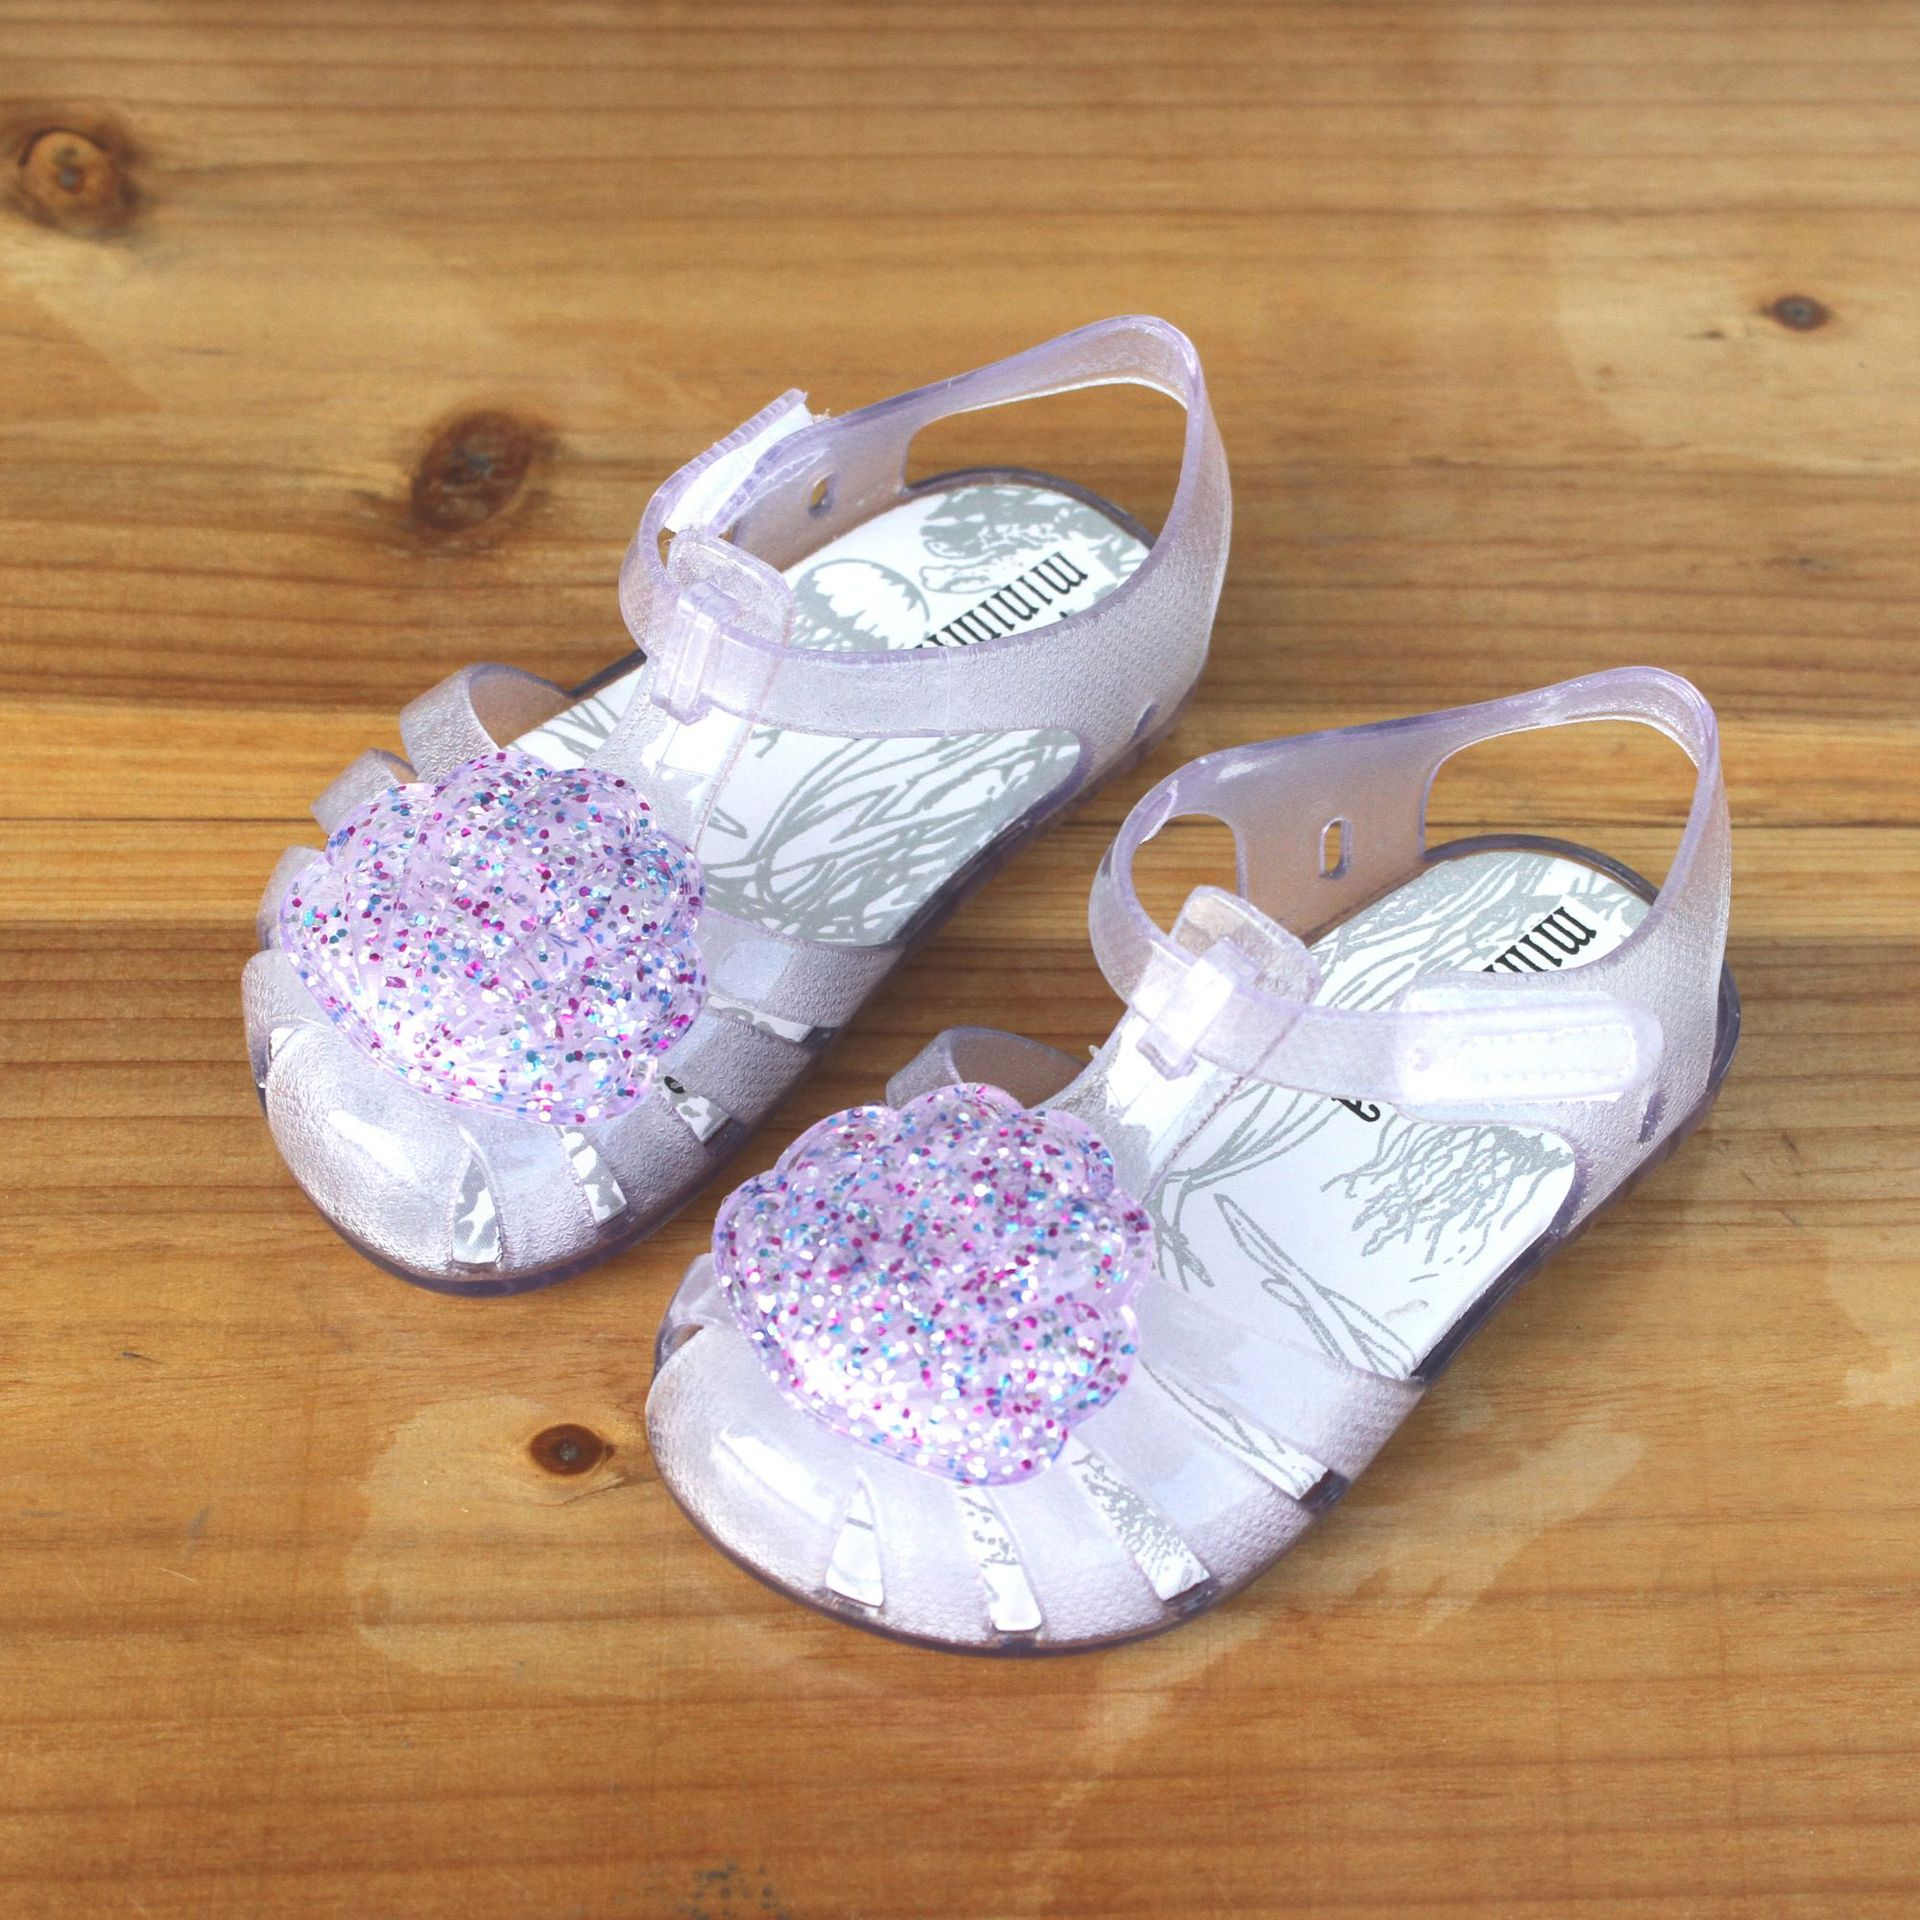 2019 New Arrival Kids Mini Jelly Sandals For Baby Girls Cute Shell Children Summer Beach Shoes Infantil Sandalia  PVC Baotou